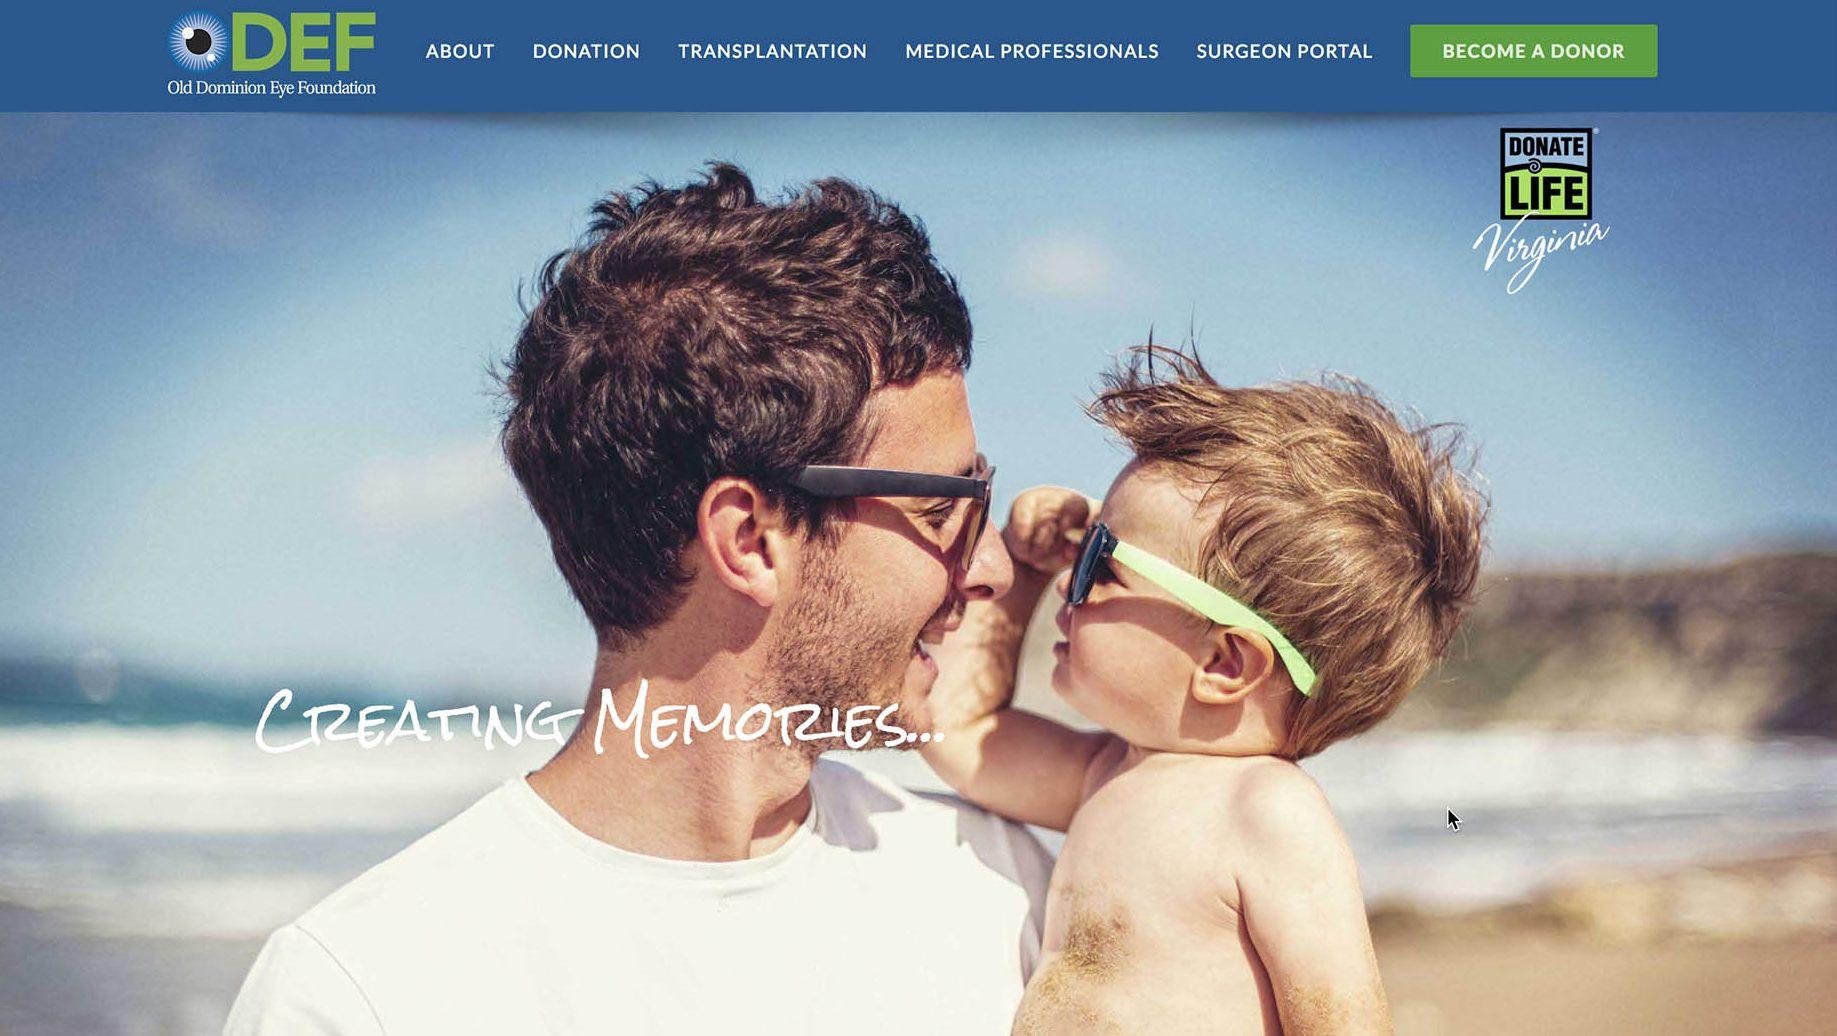 Old Dominion Eye Foundation Website